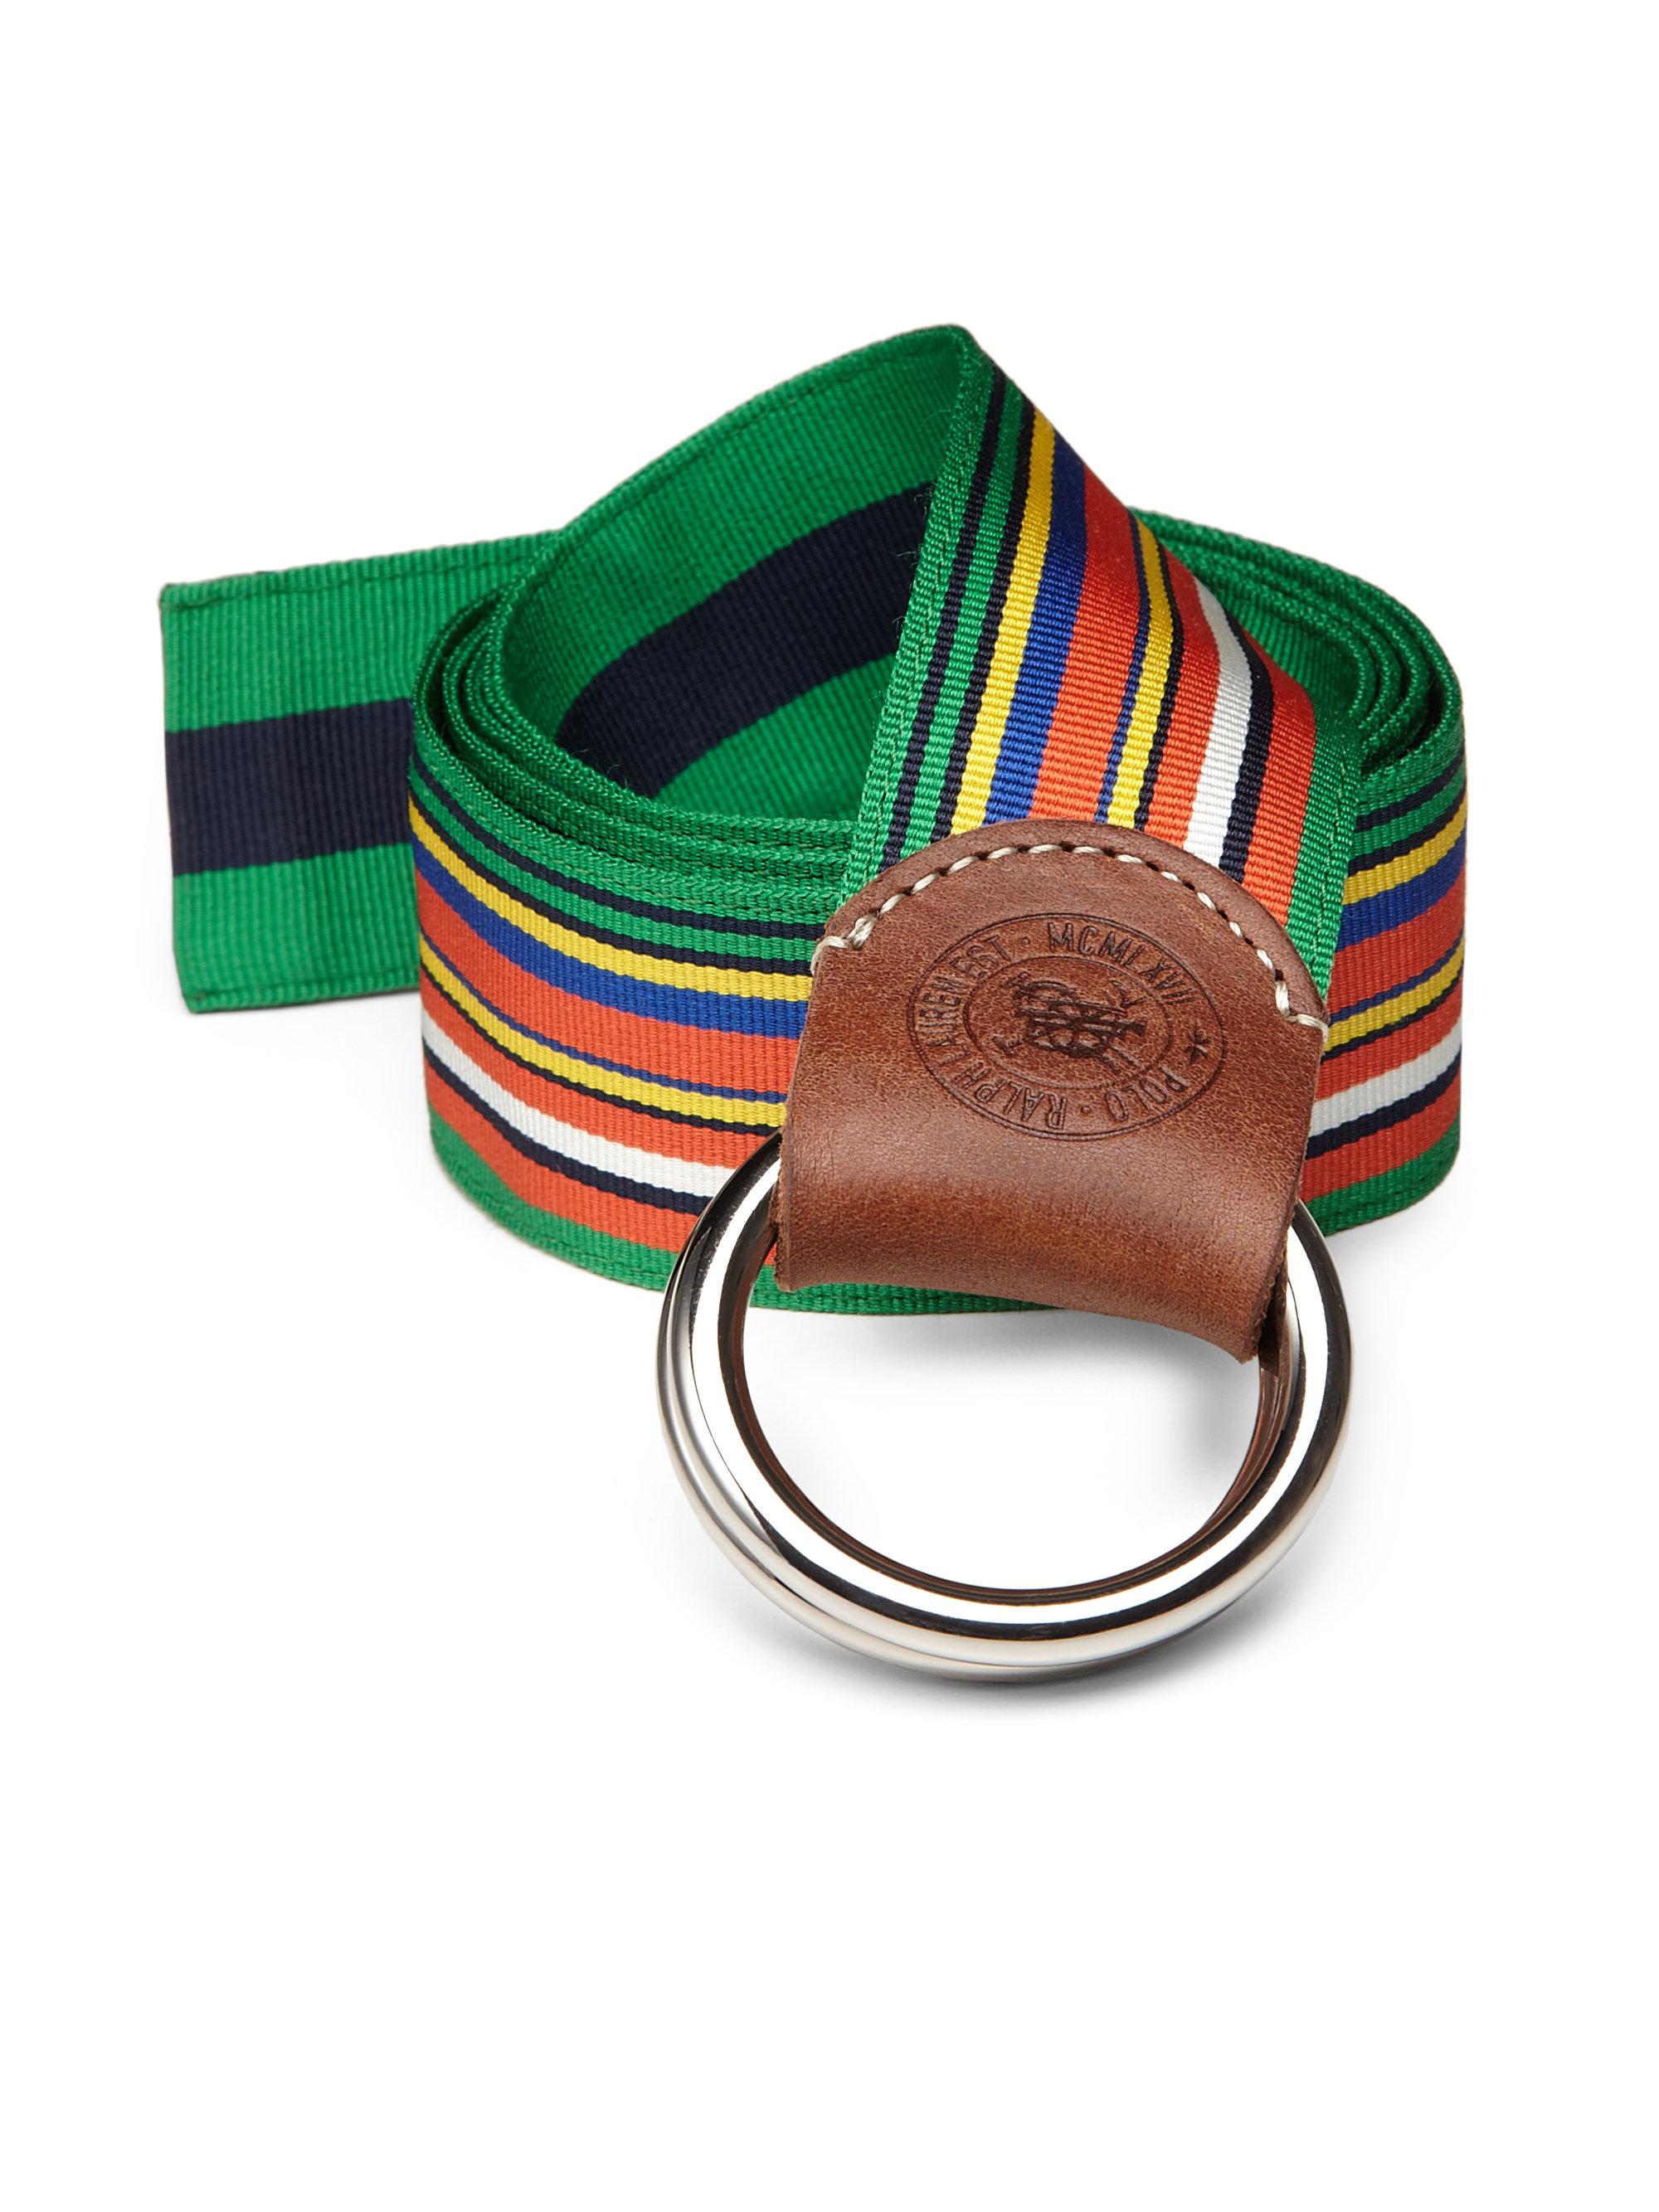 Ralph Lauren Ring Belt Black